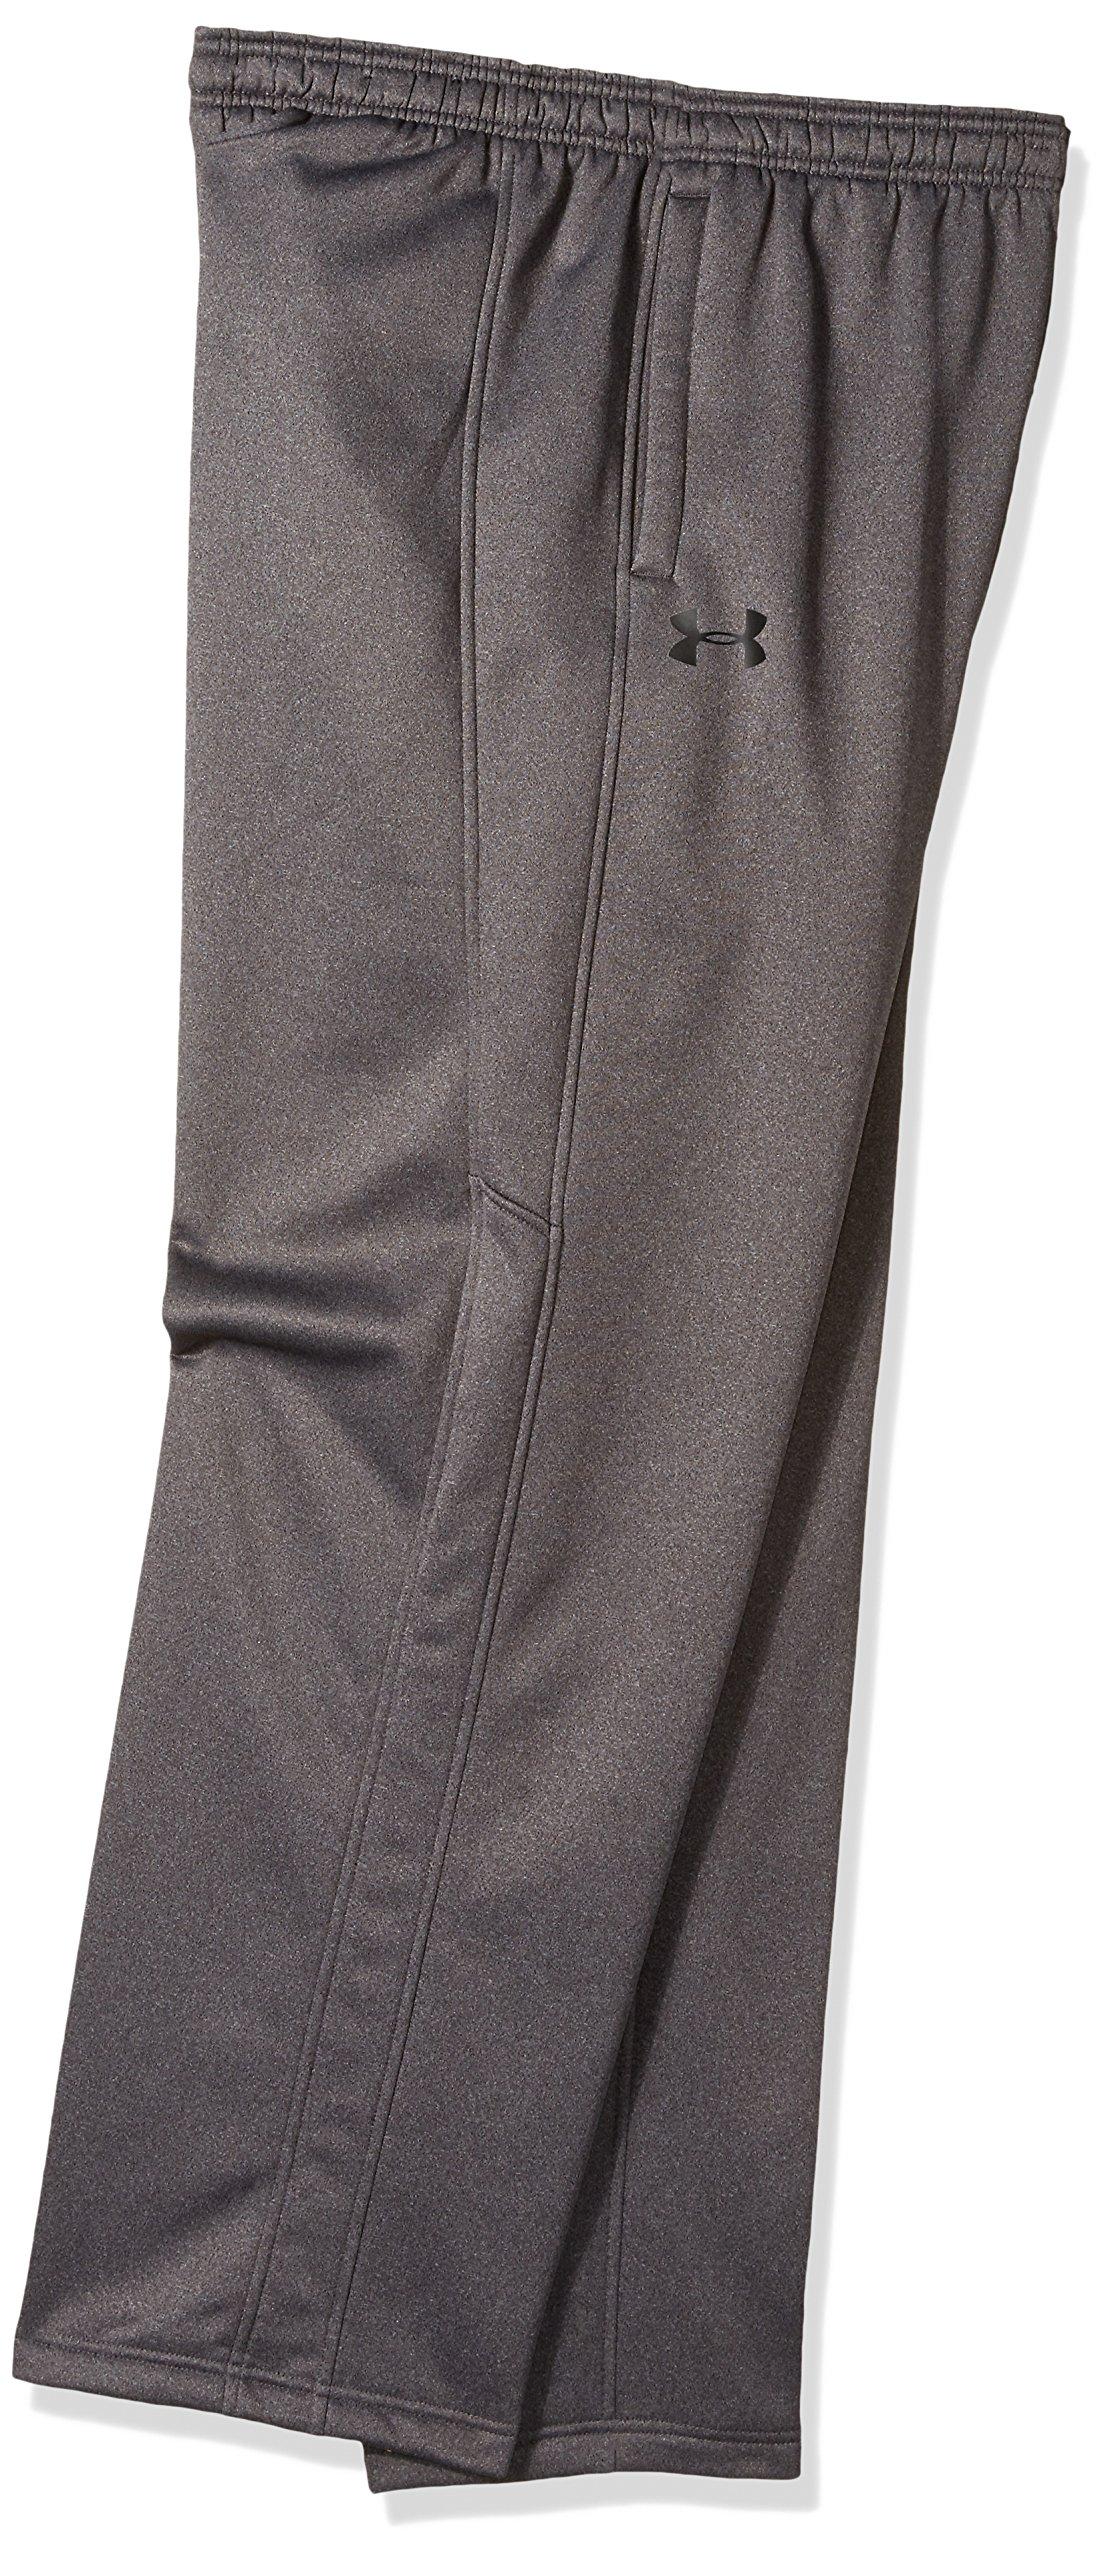 Under Armour Men's Storm Armour Fleece Pants, Carbon Heather /Black, X-Small by Under Armour (Image #2)